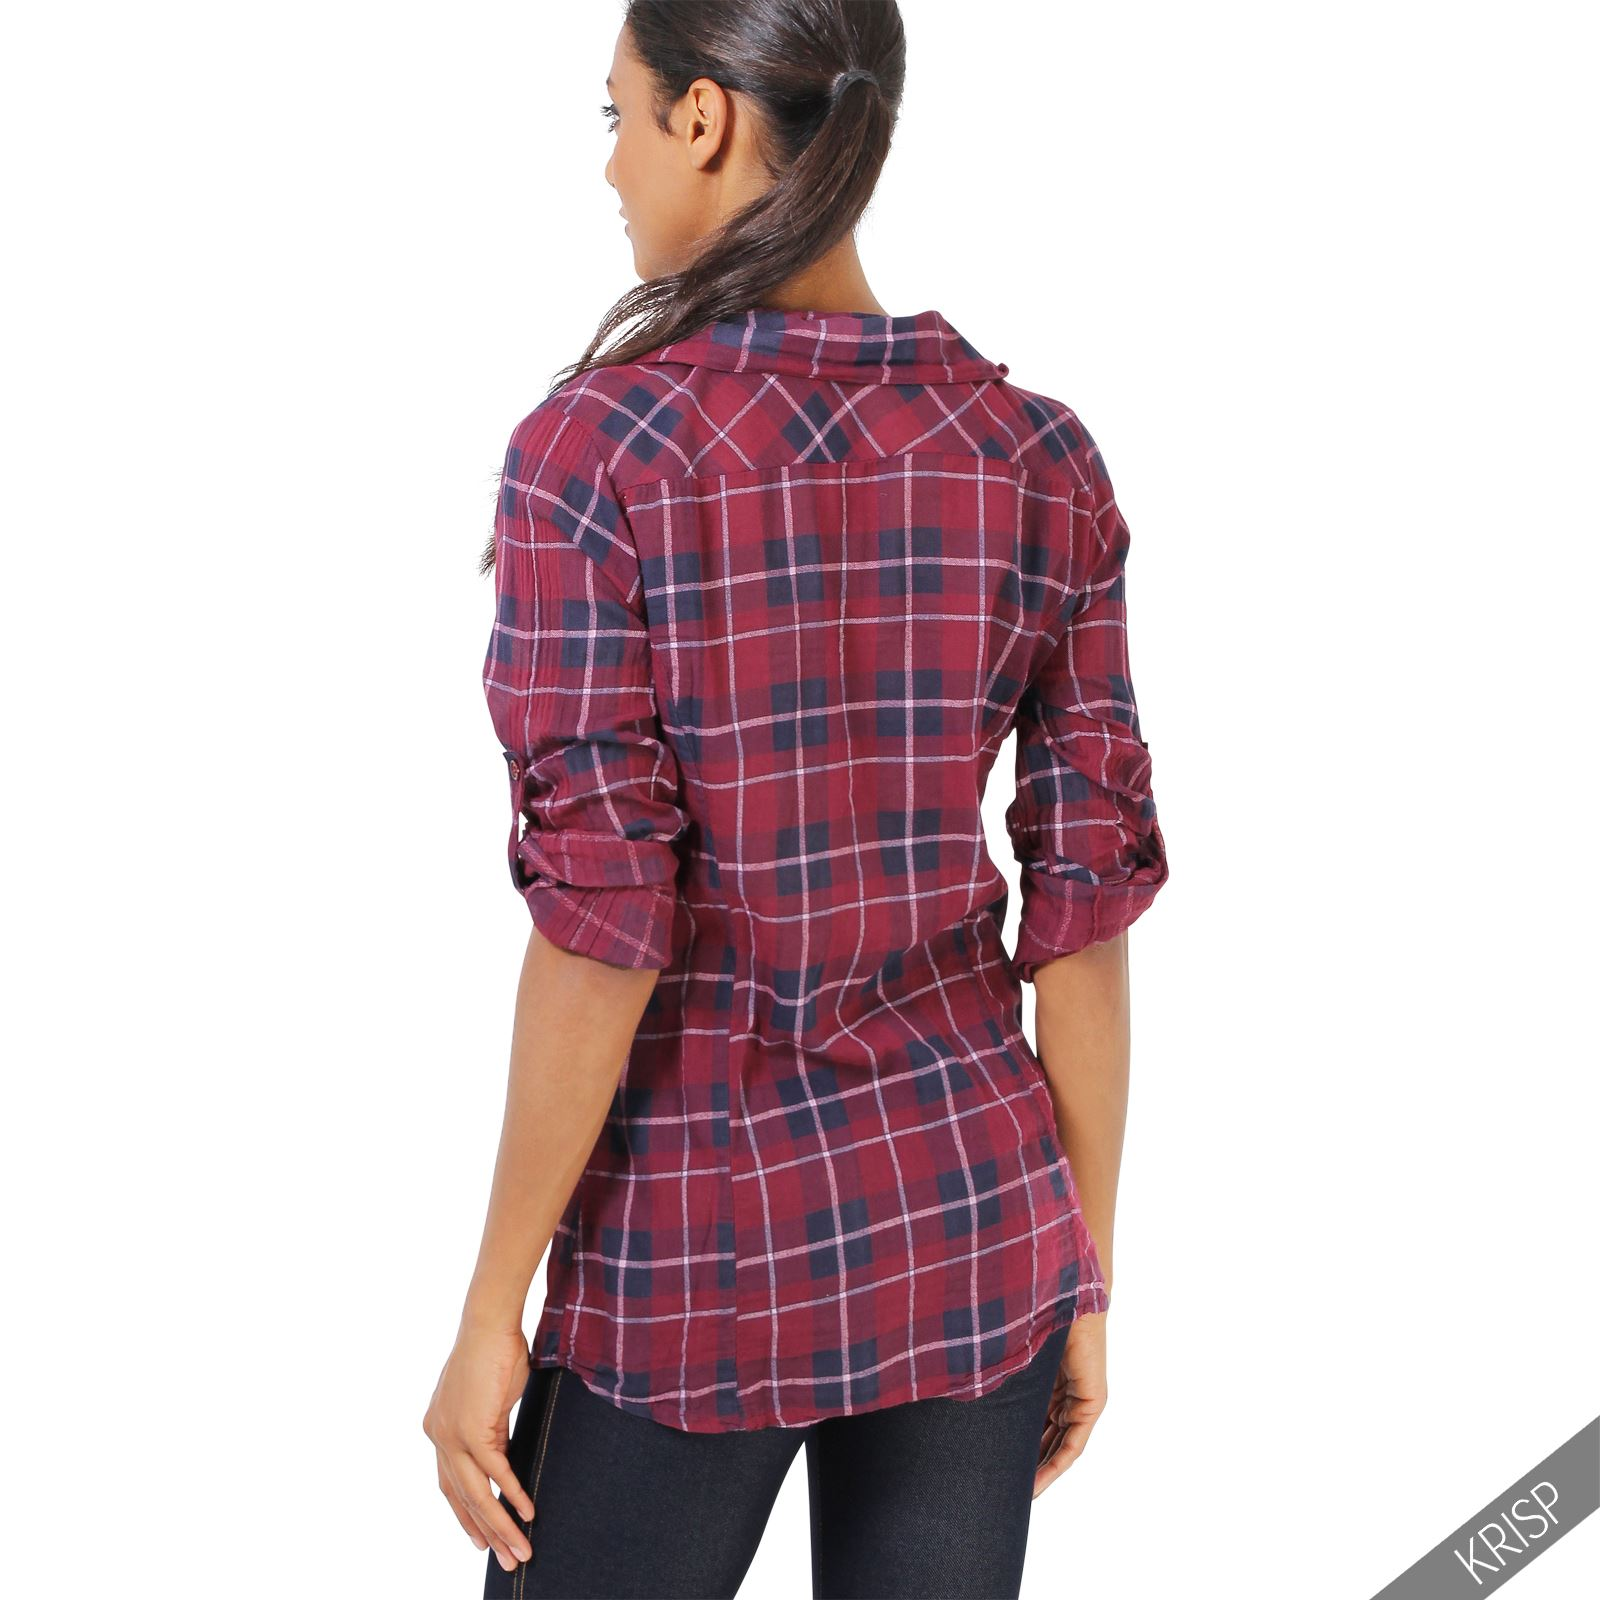 Tartan clothing for women